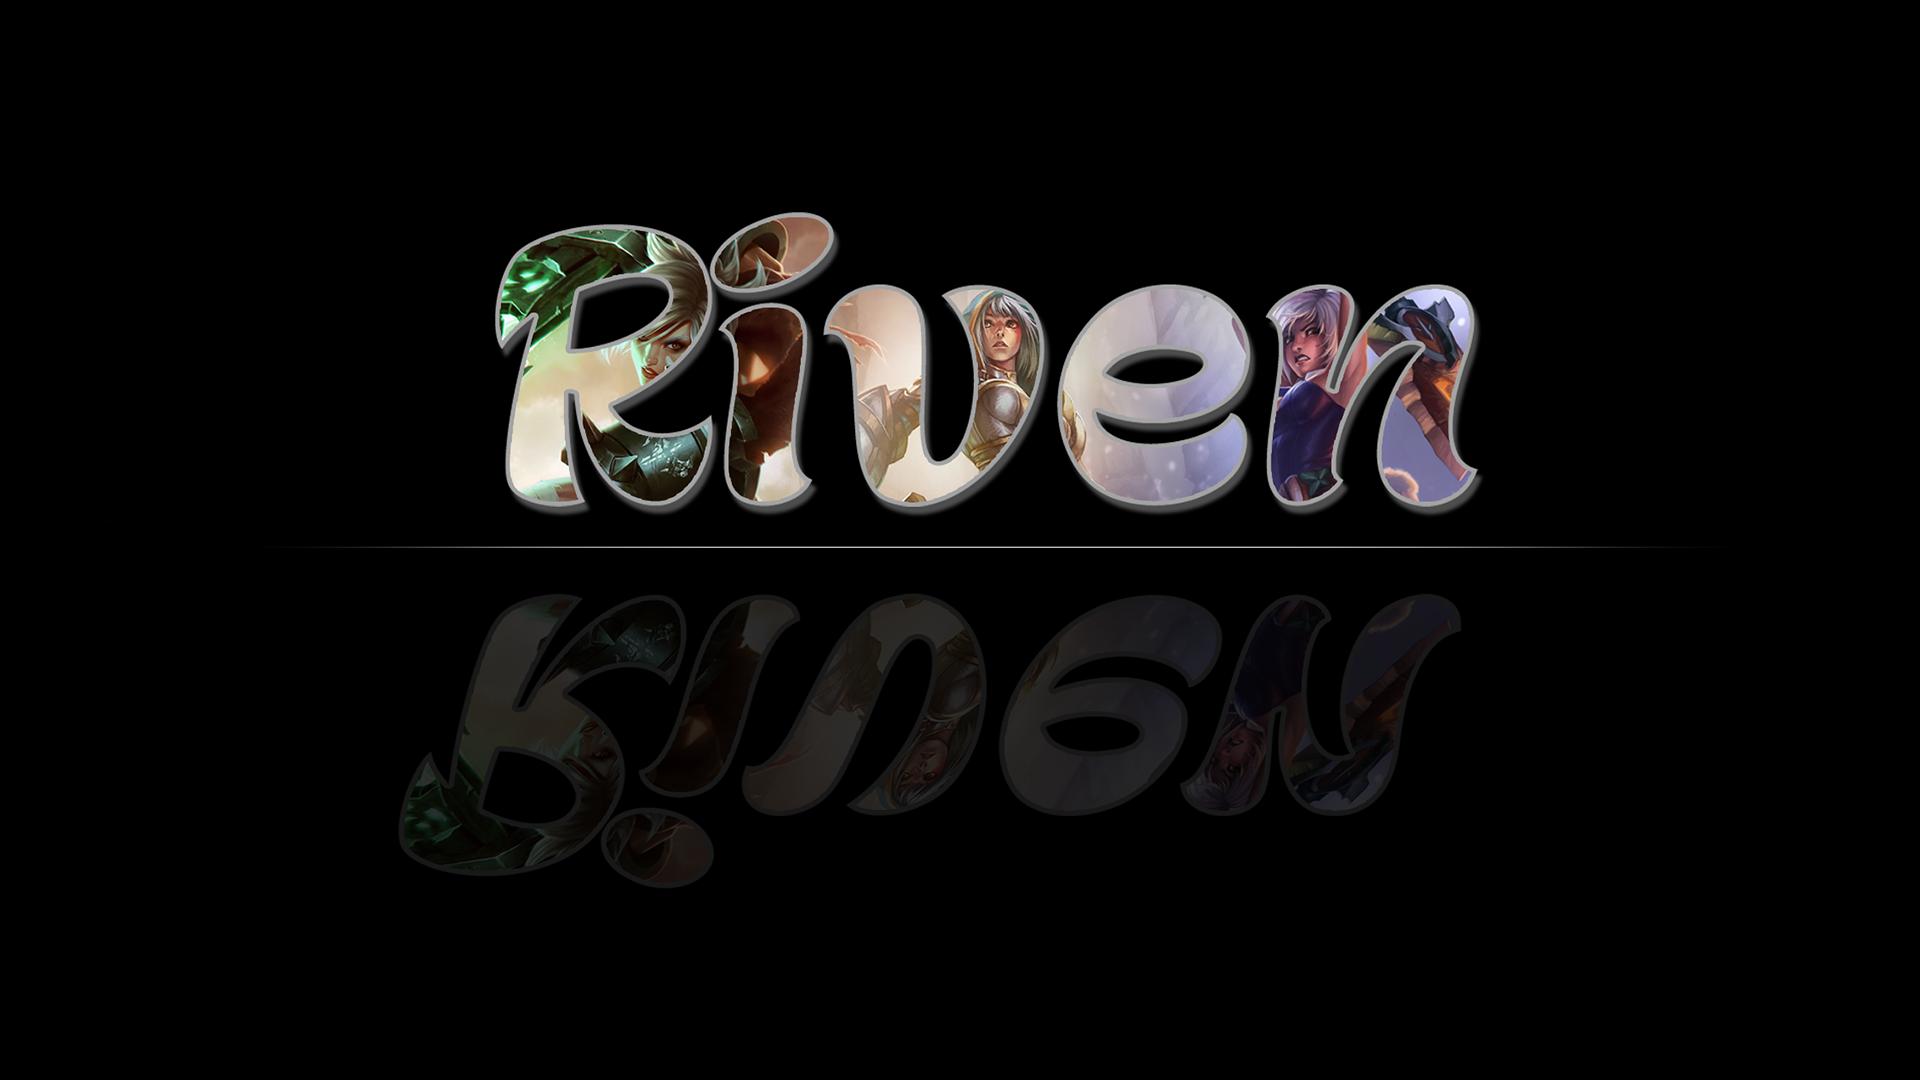 Riven Skins wallpaper